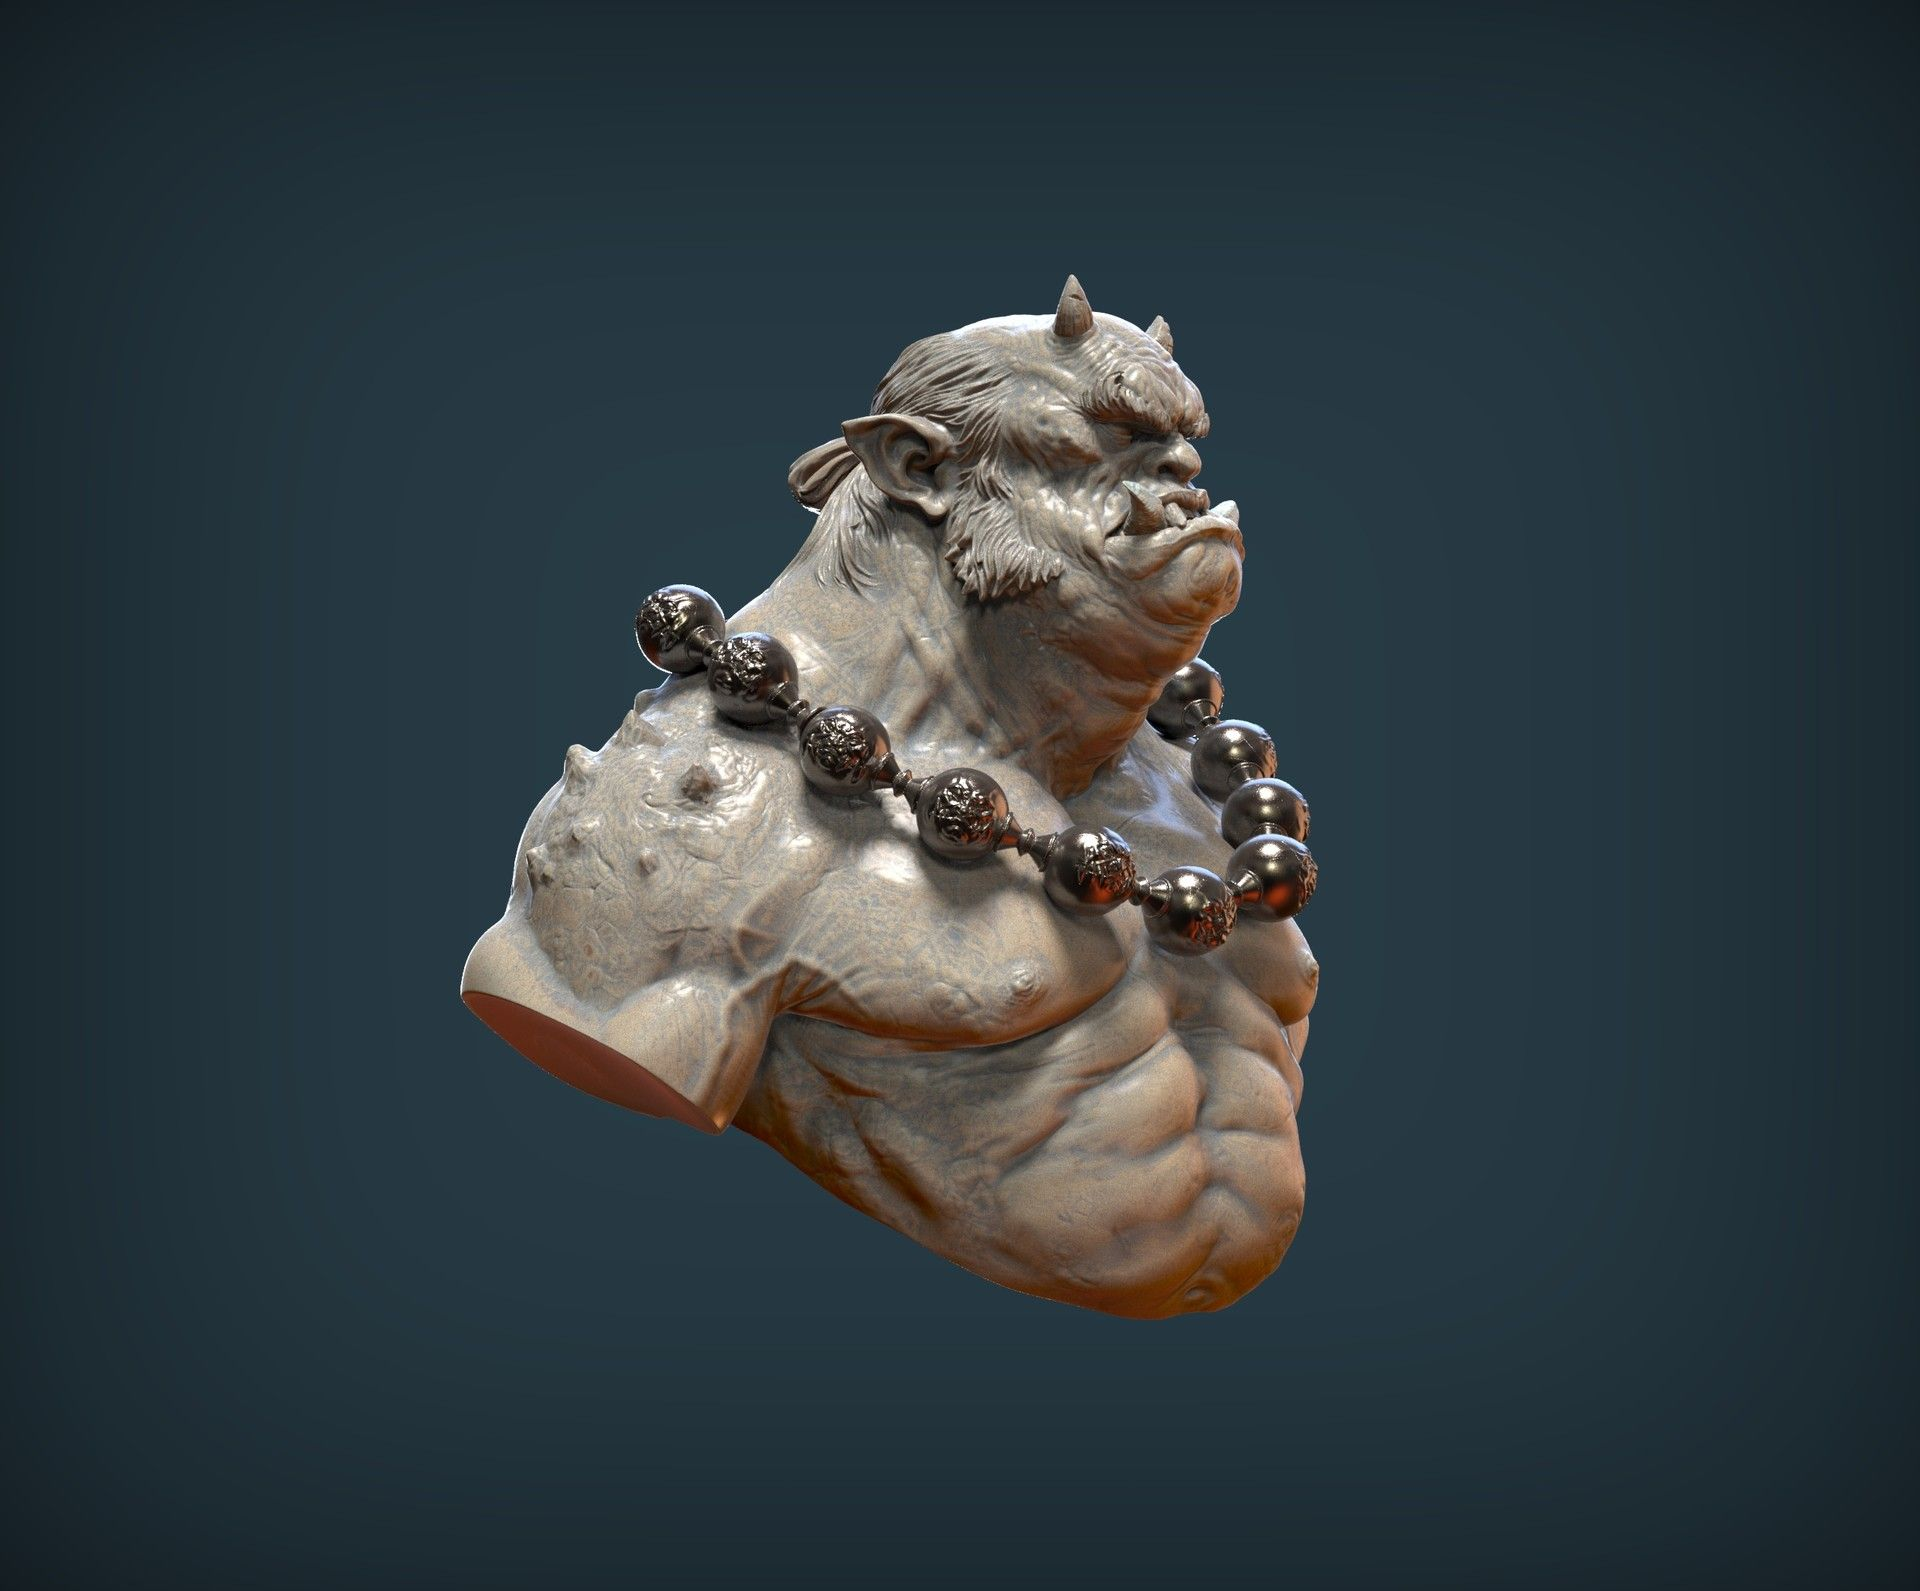 ArtStation - Makoto, the guardian (Bust), Raul Garcia Latorre ...